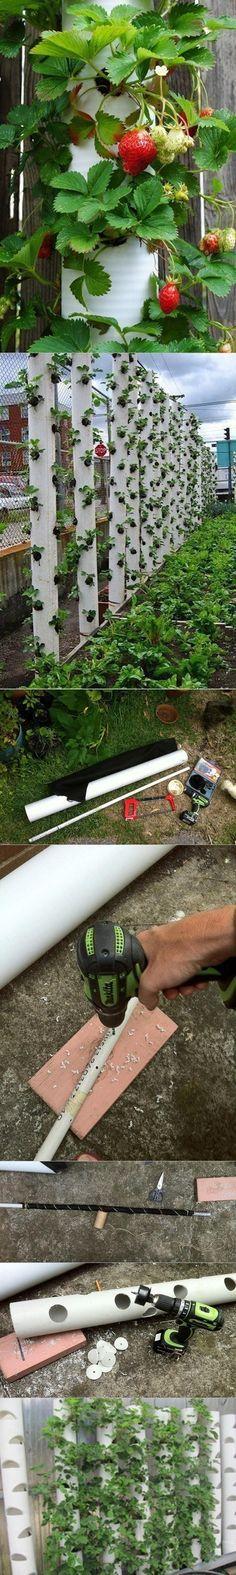 DIY Verticle PVC Pipe Strawberry Planter Tower   www.FabArtDIY.com LIKE Us on Facebook ==> https://www.facebook.com/FabArtDIY